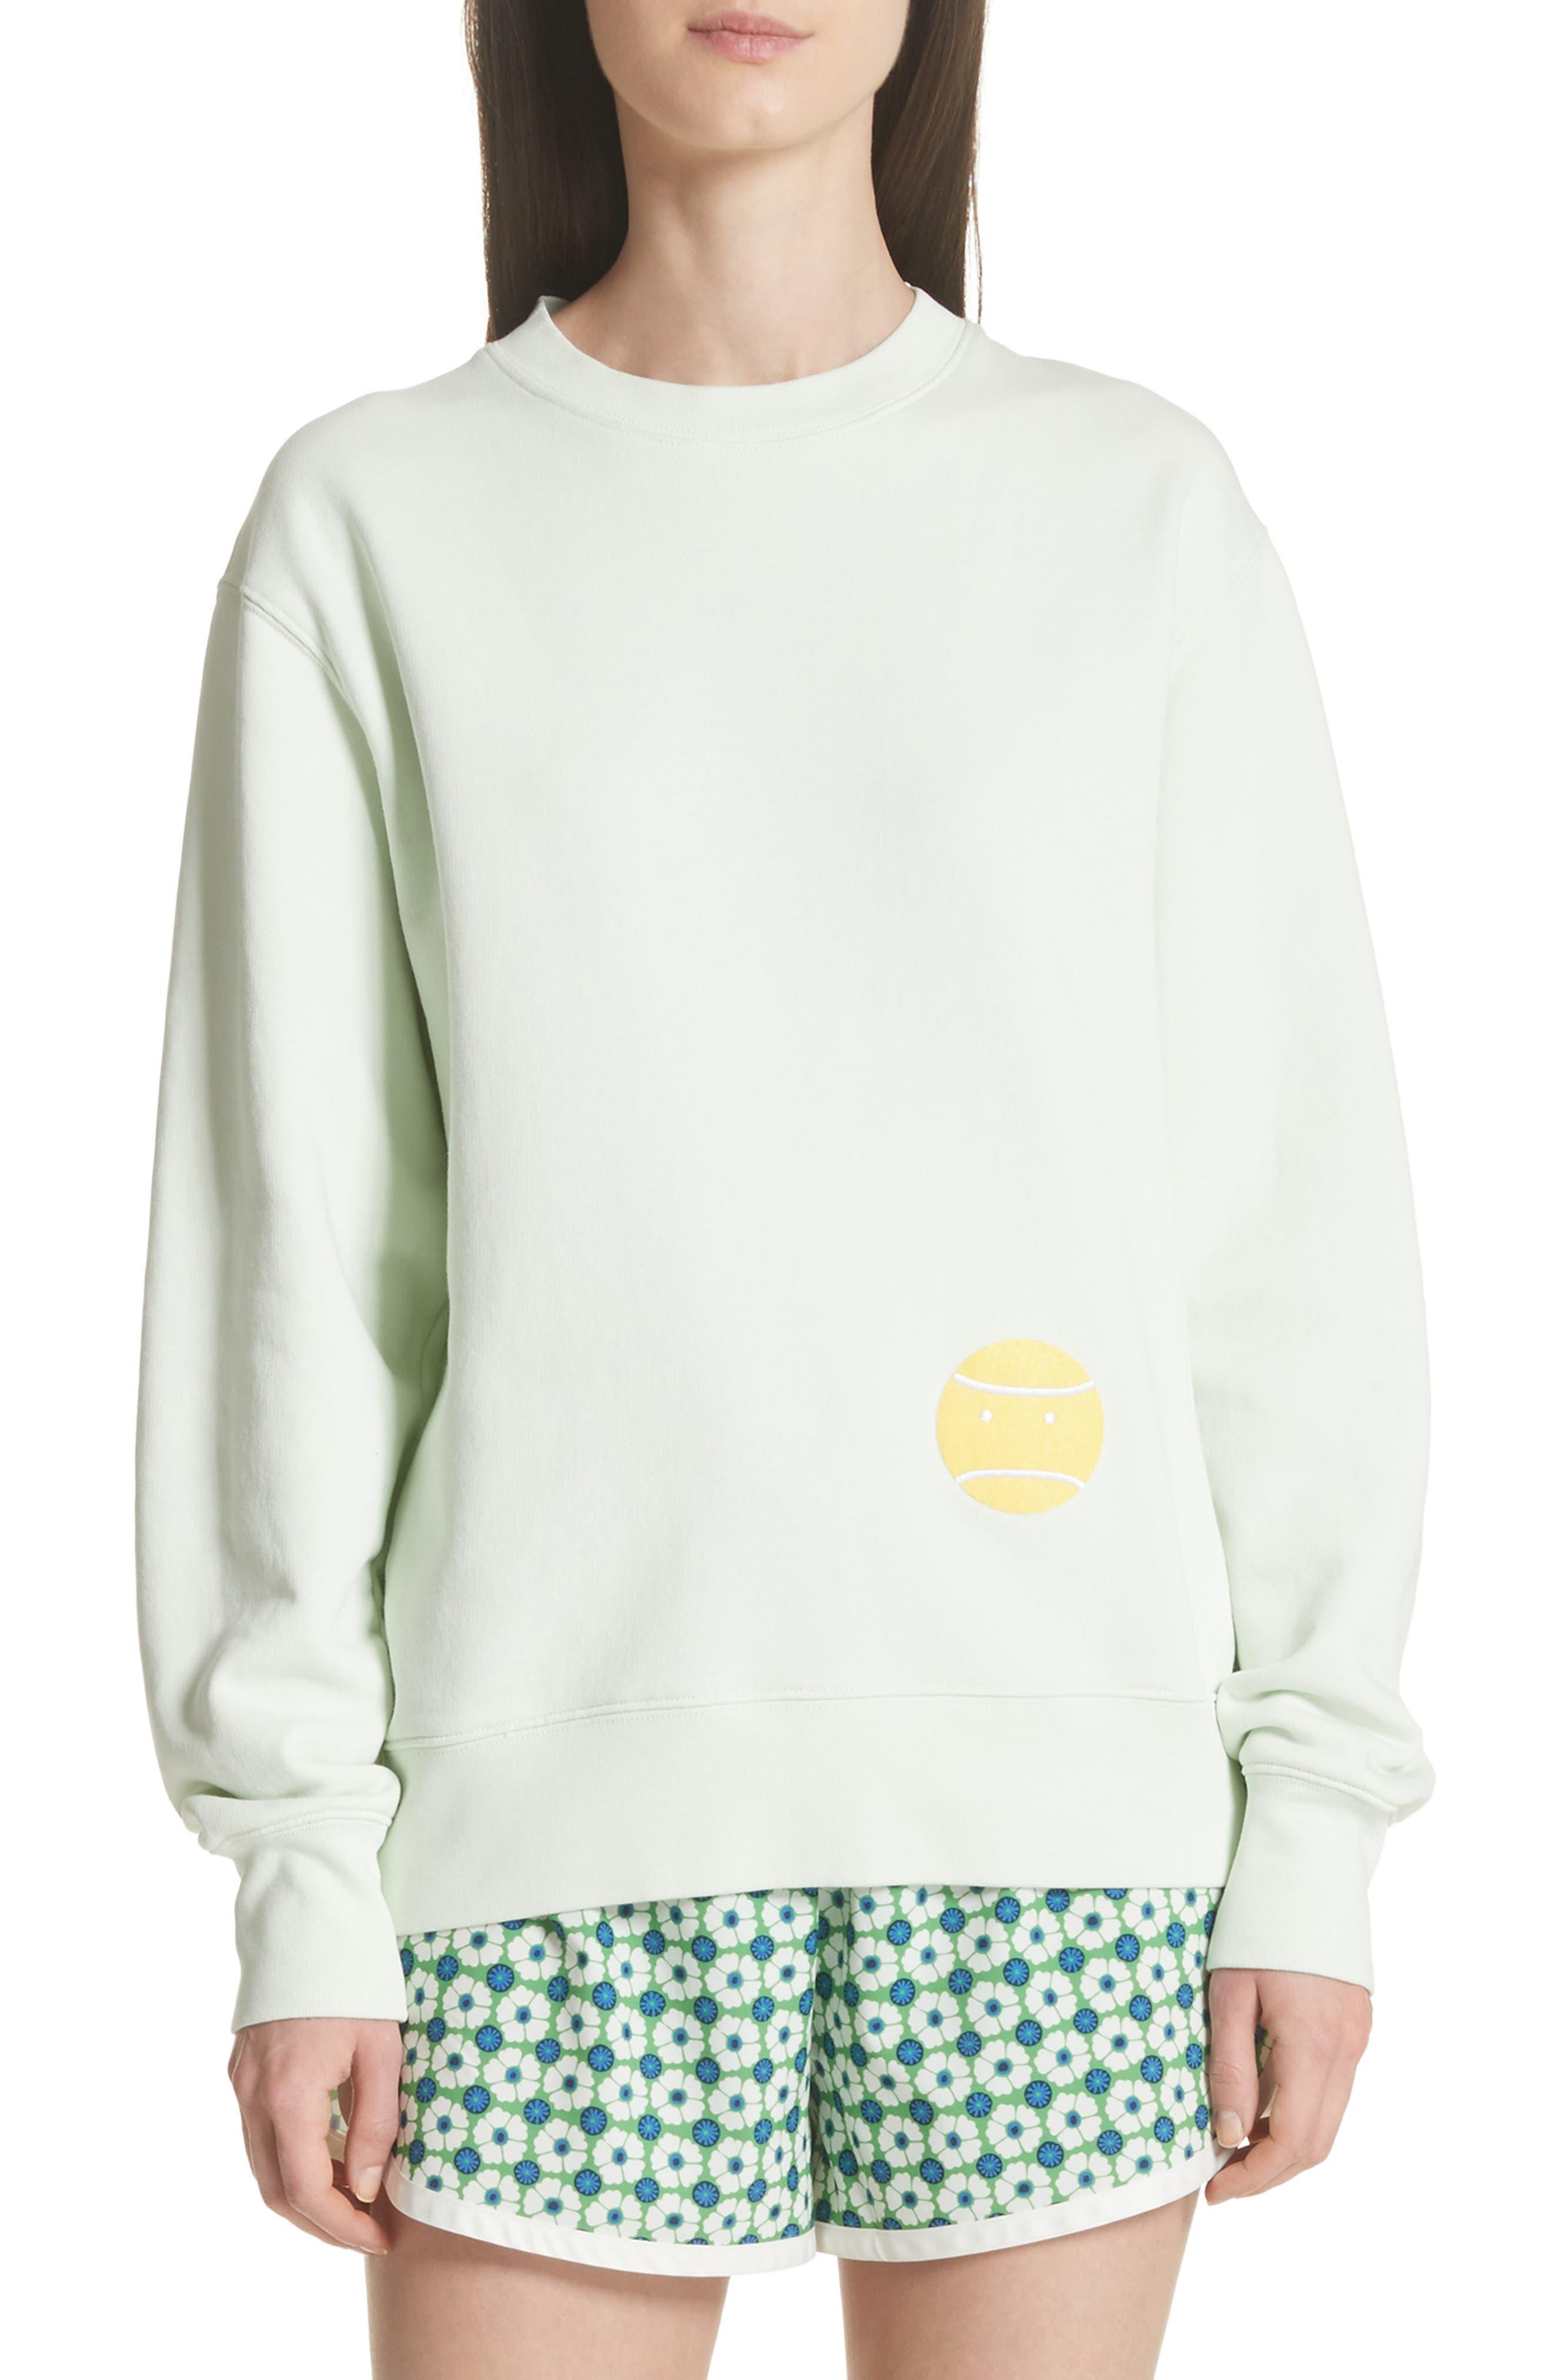 Tory Sport Little Grump French Terry Sweatshirt